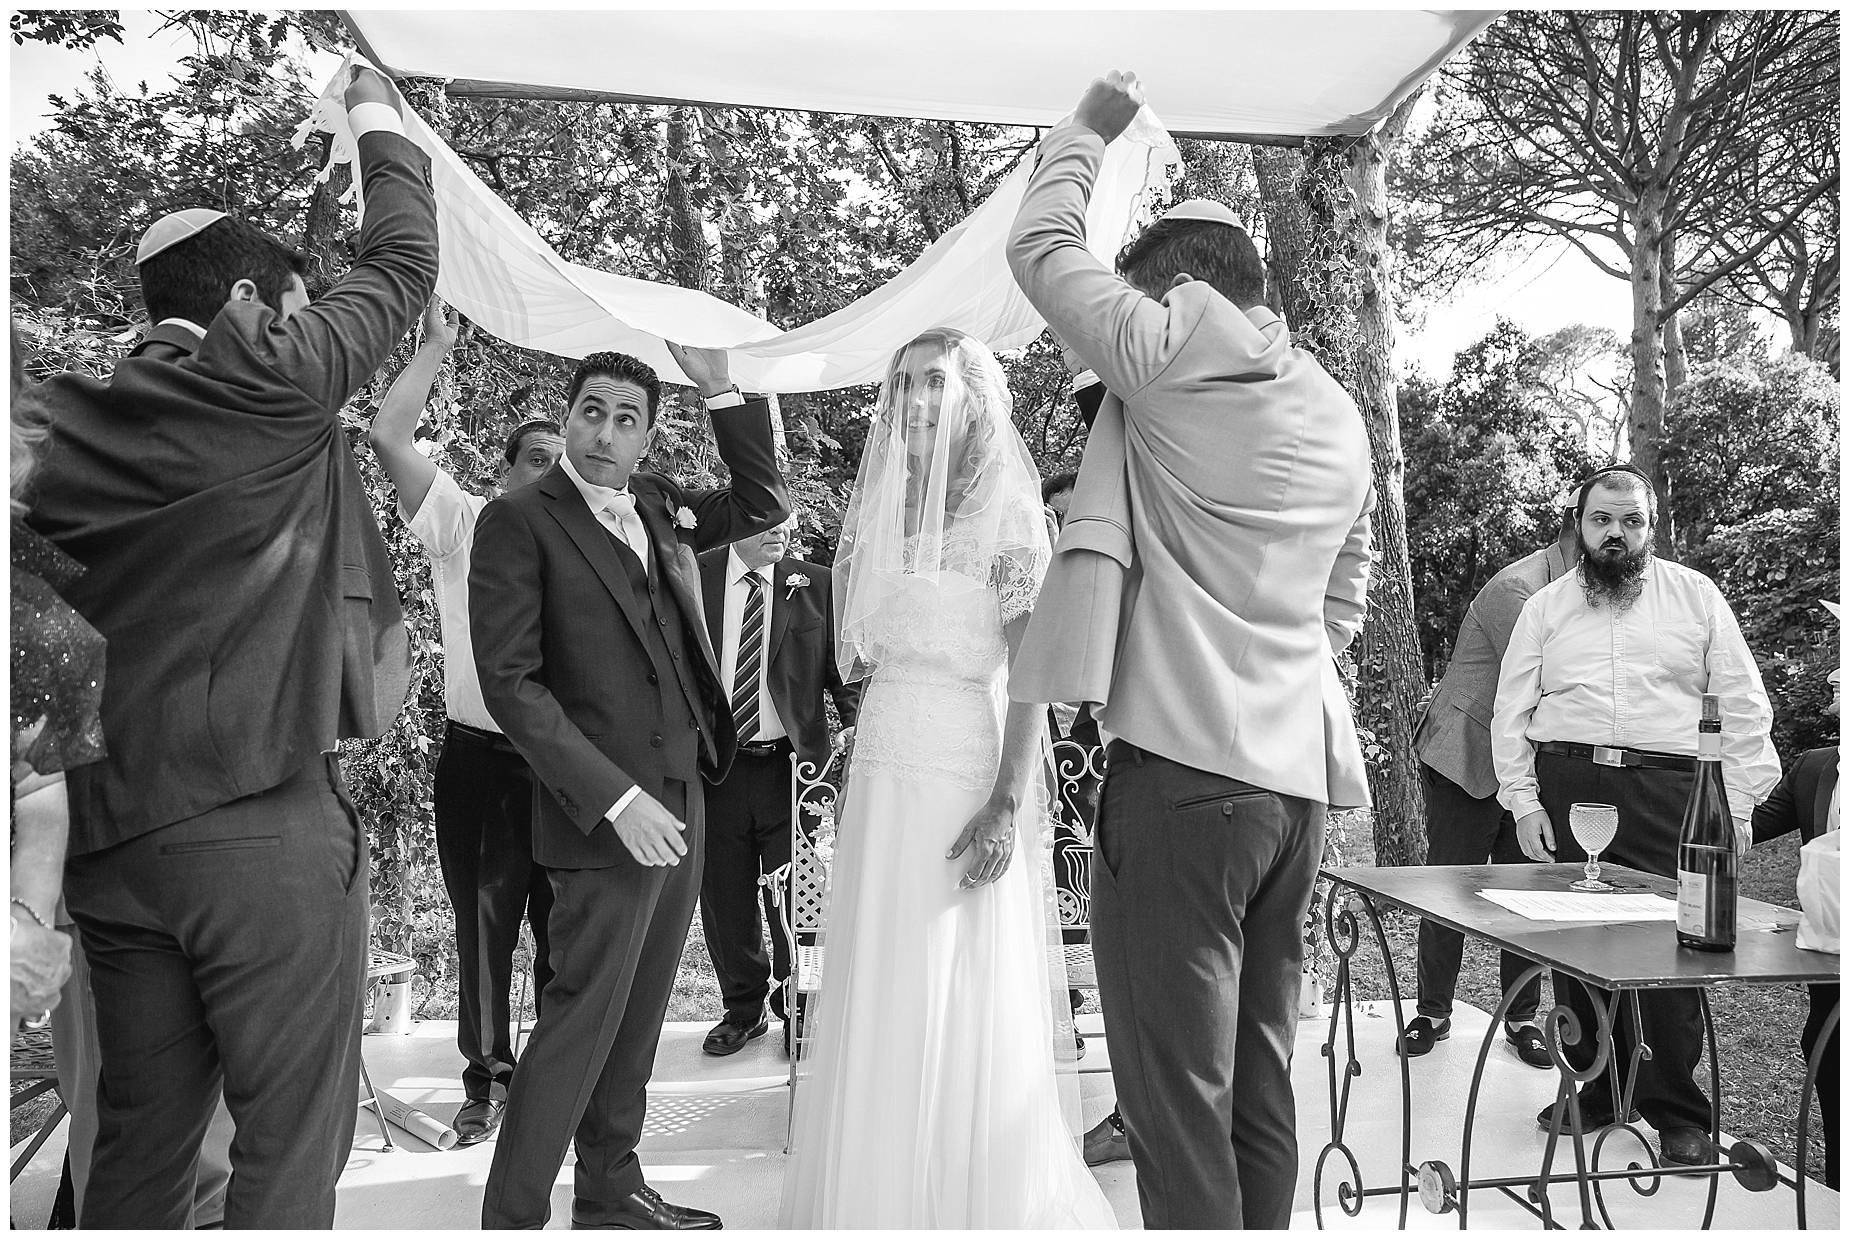 jewish wedding ceremony continues